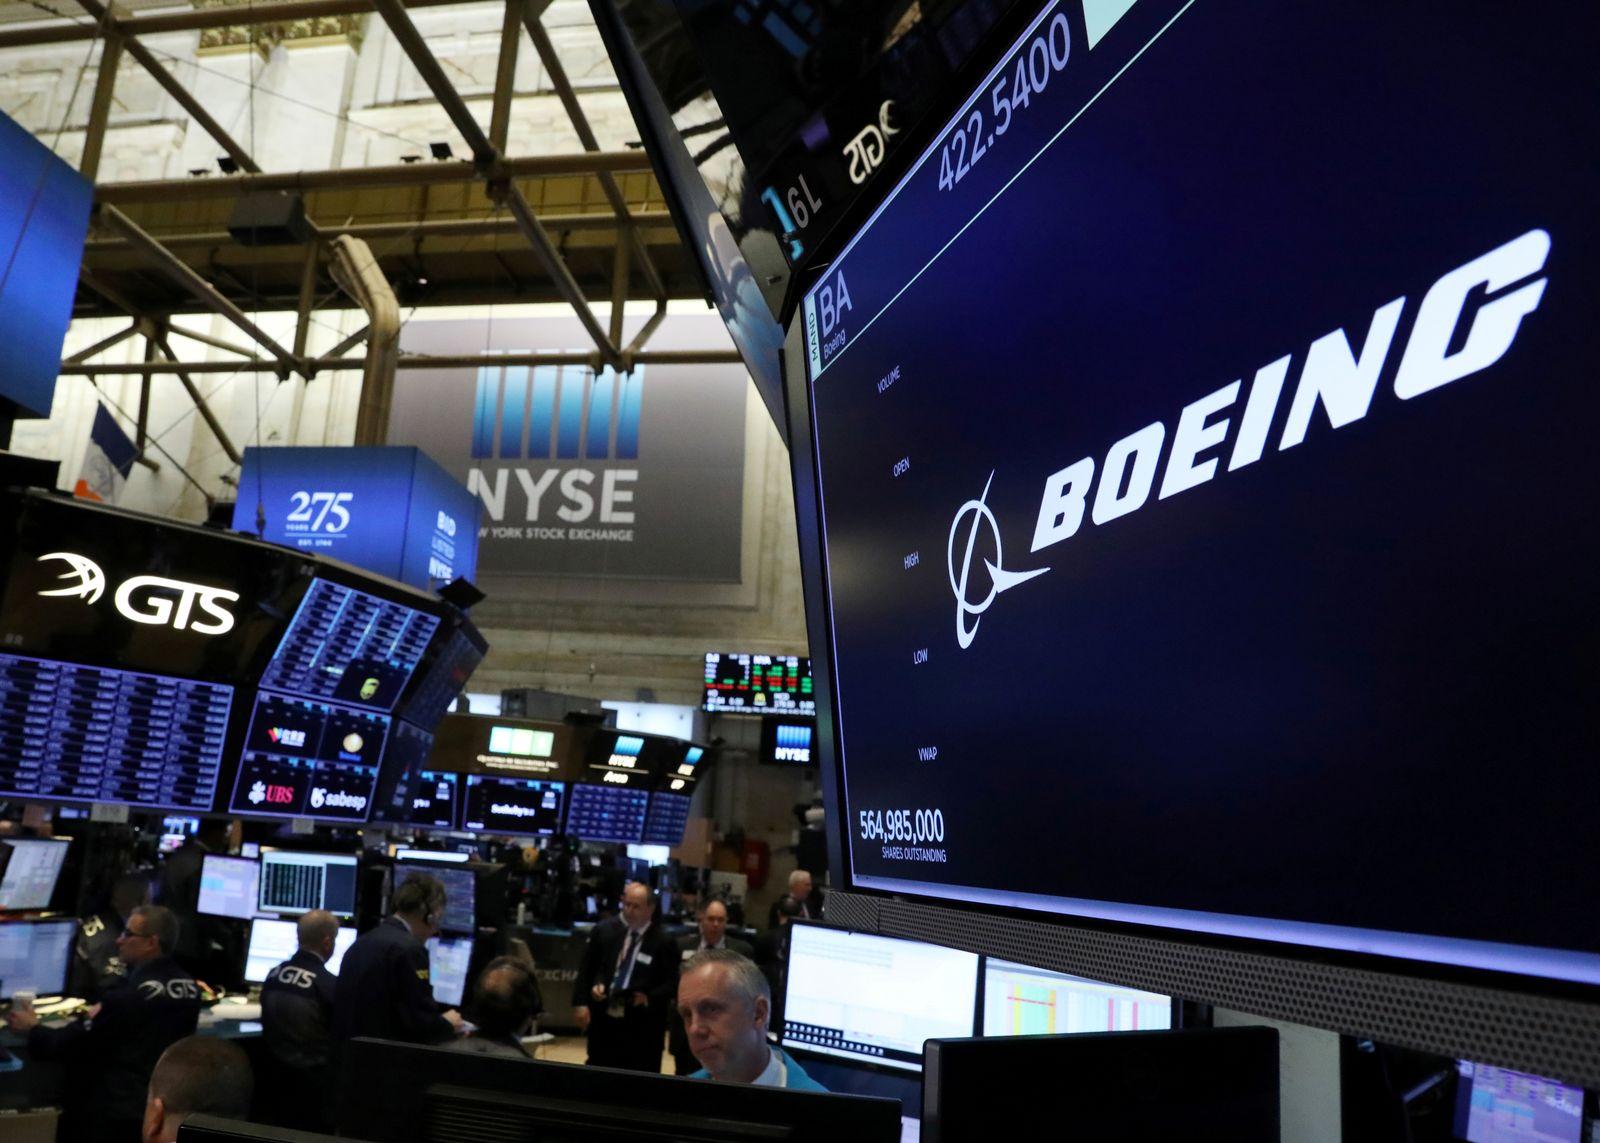 Boeing Börse